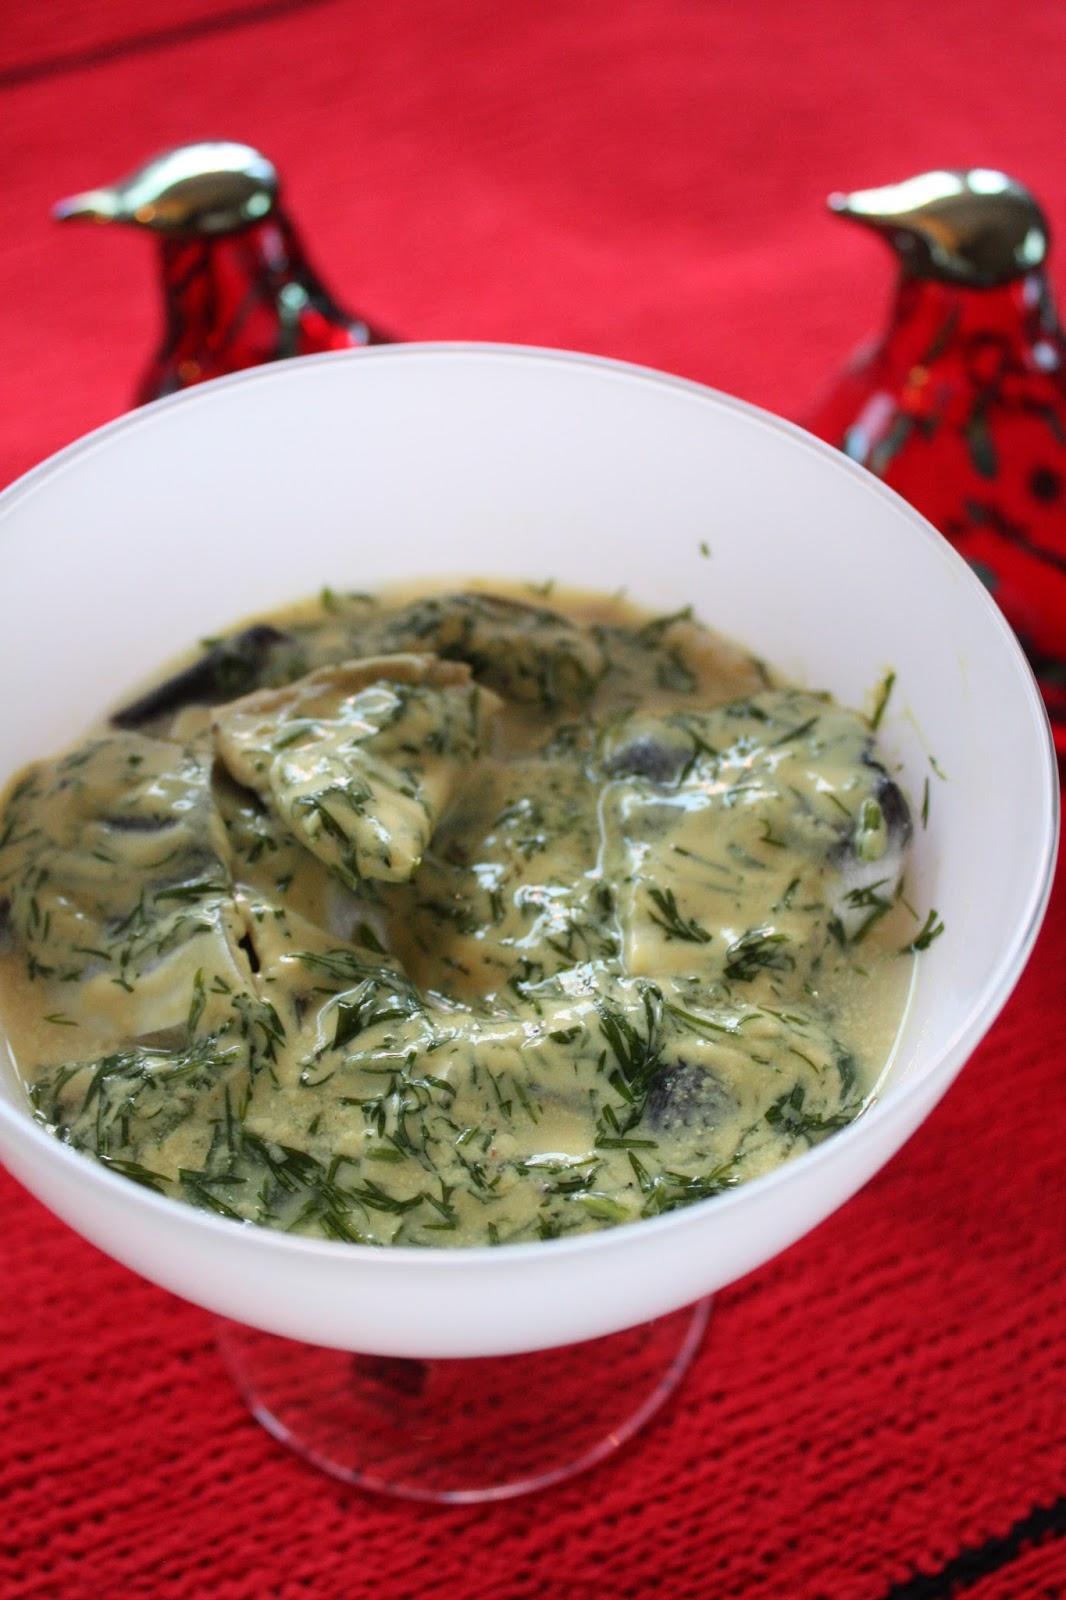 sinappisilakka sinappisilakat sinappi silakka joulusilakat joulu kalaruoka kala maustekala ruoka resepti